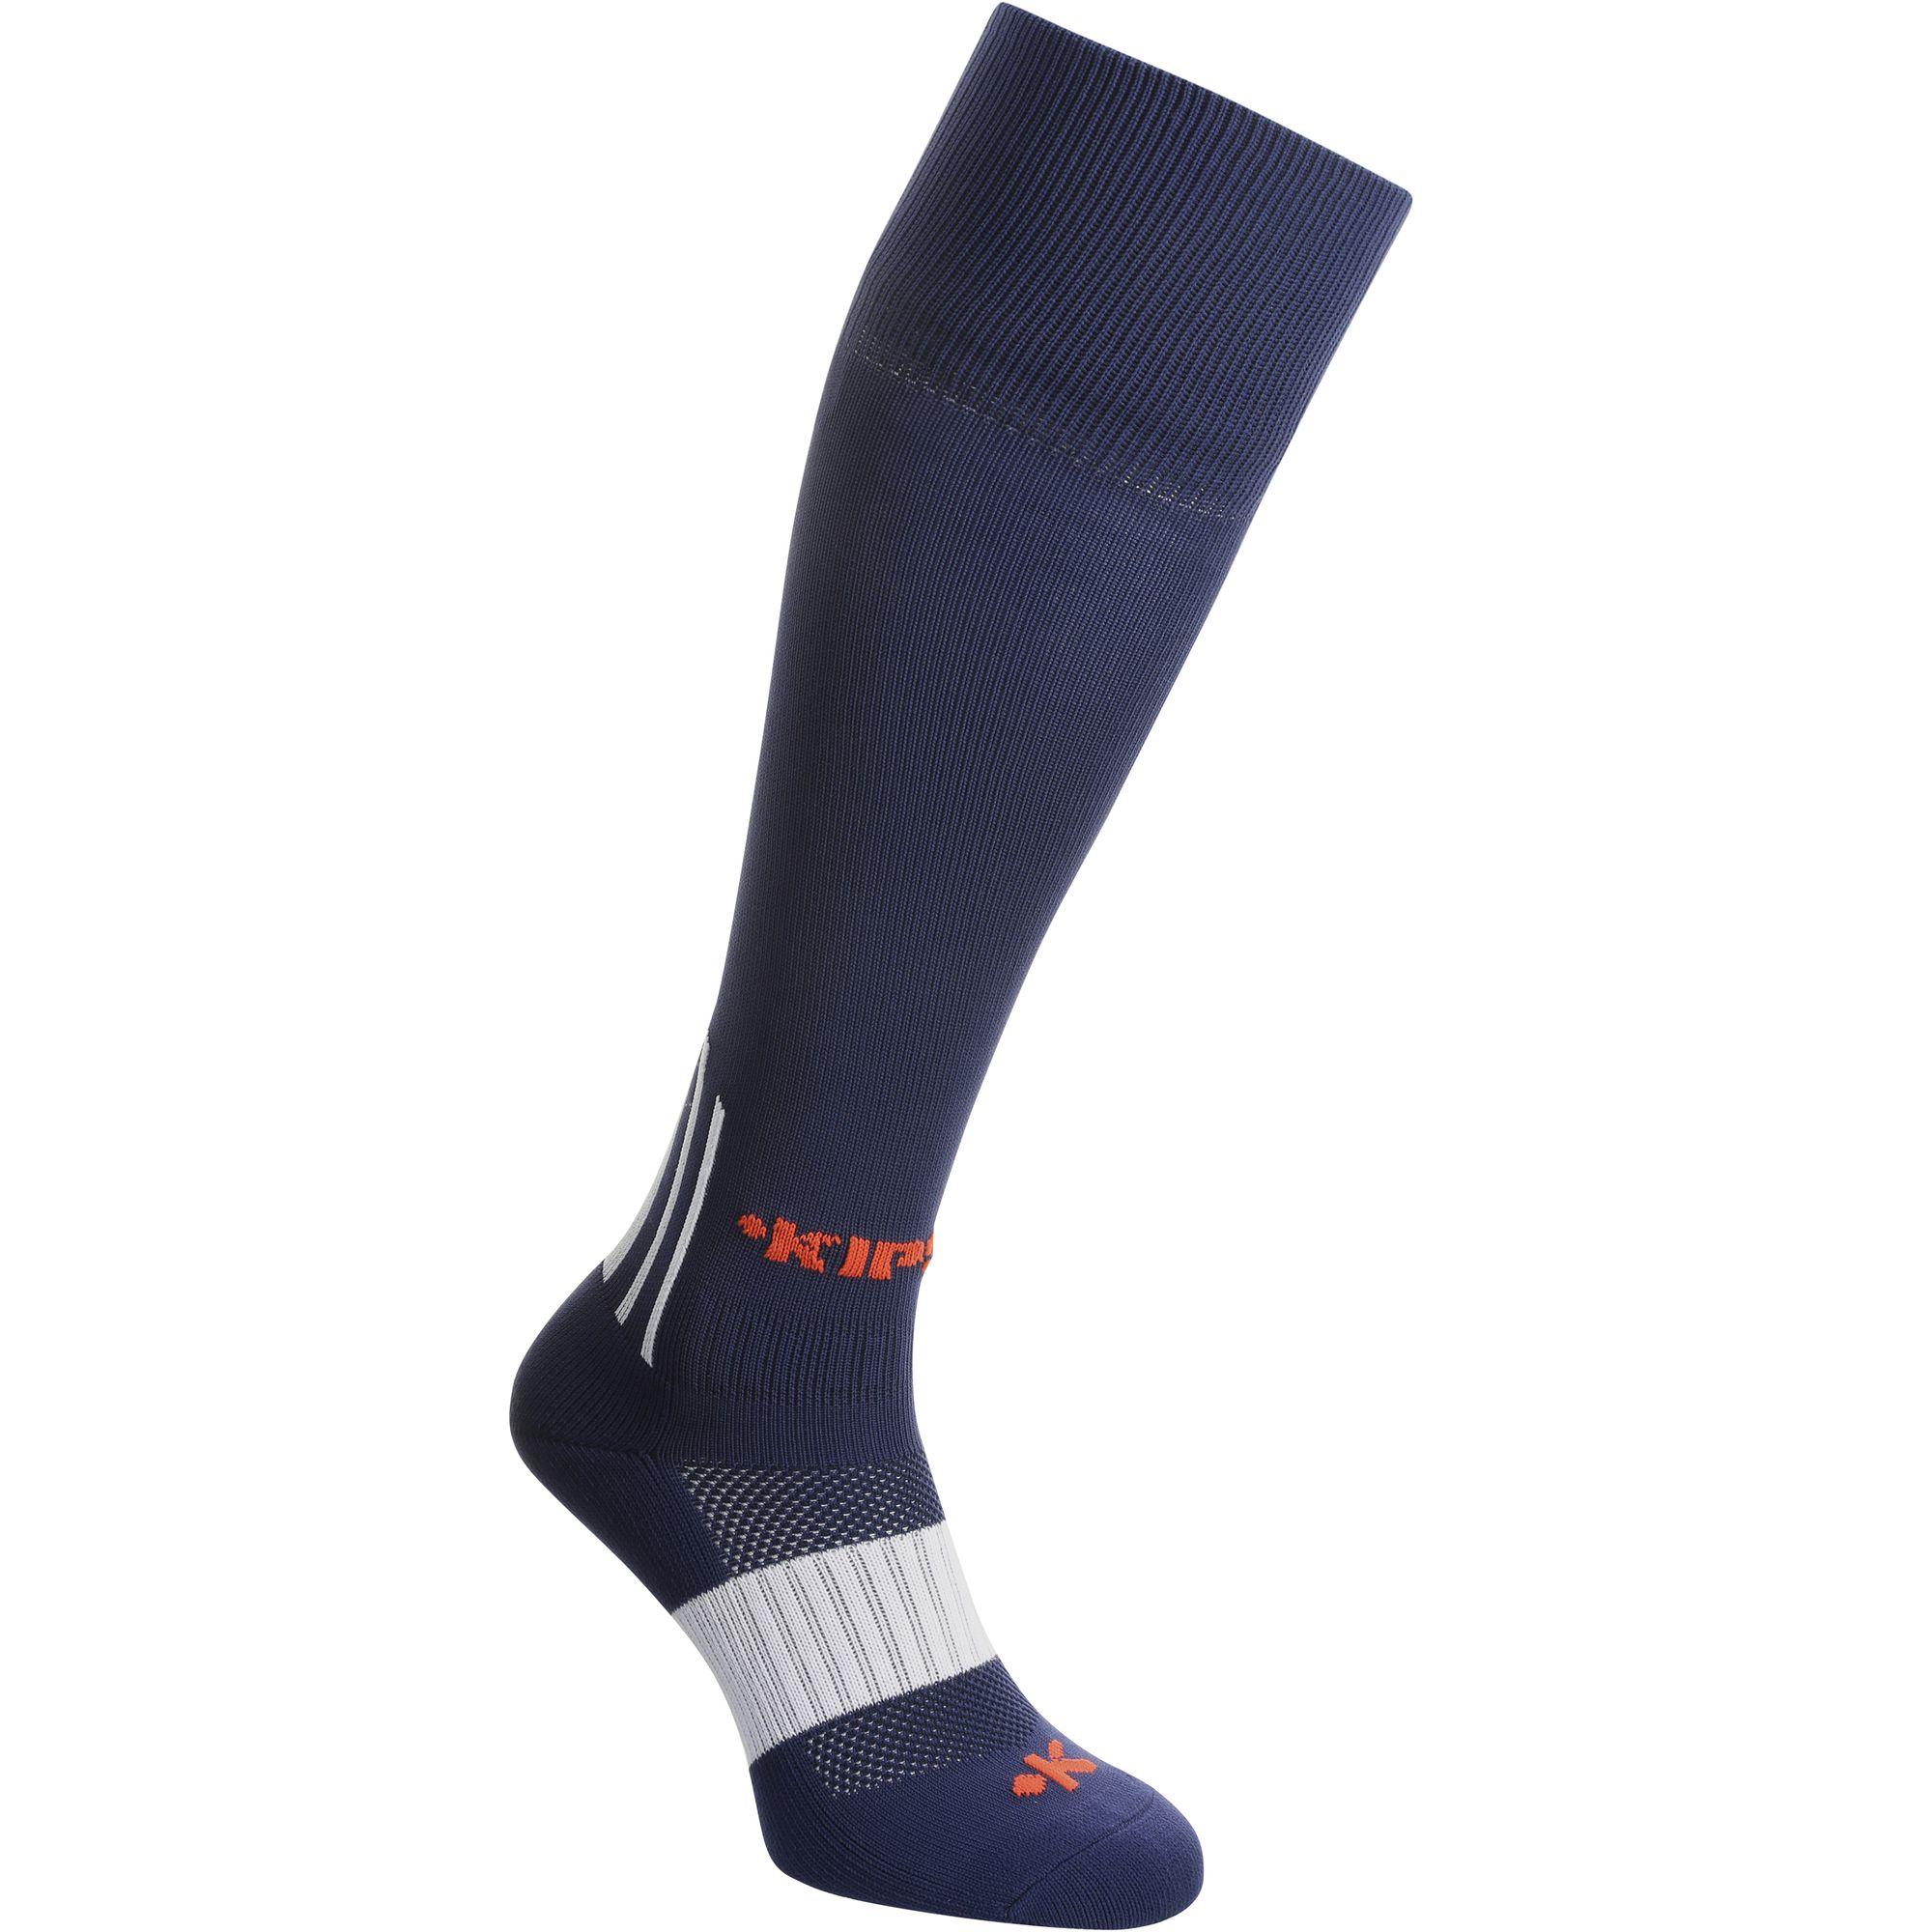 Chaussettes hautes de football adulte F500 bleues marines